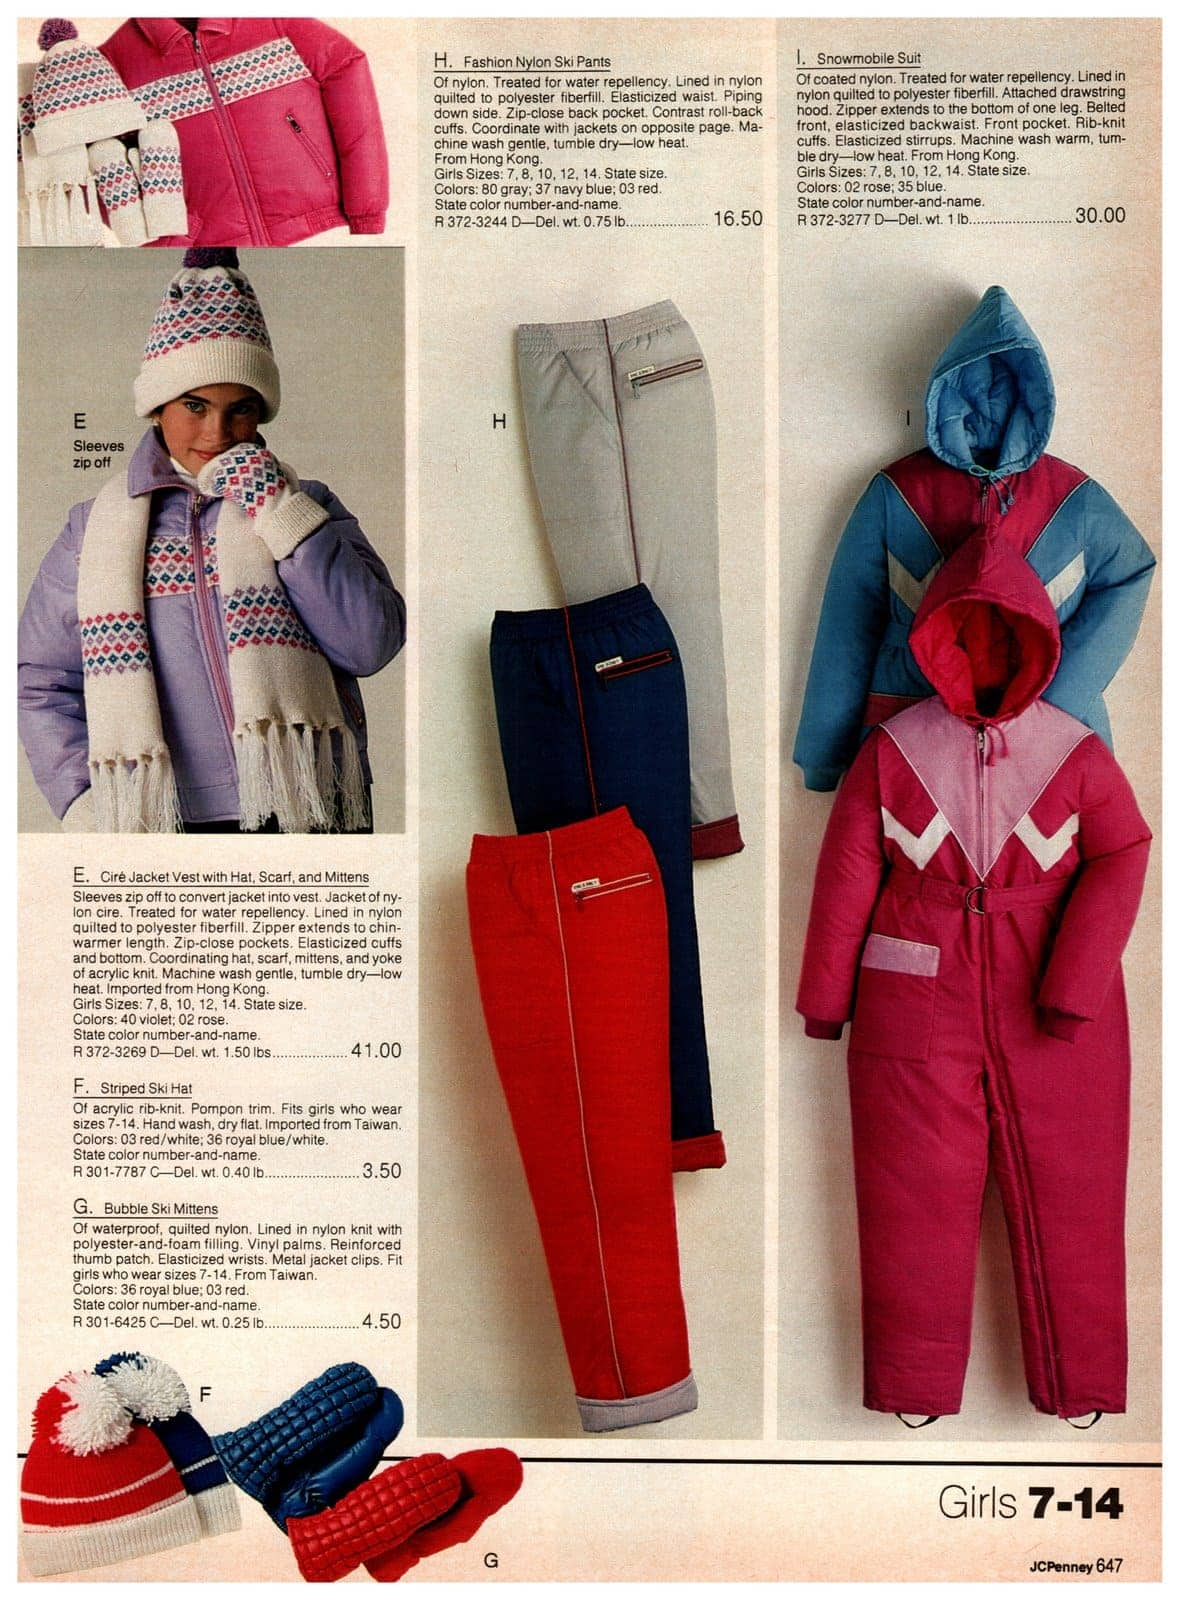 Fashion nylon ski pants, snowmobile suits, jacket vests, striped ski hats and bubble ski mittens for girls